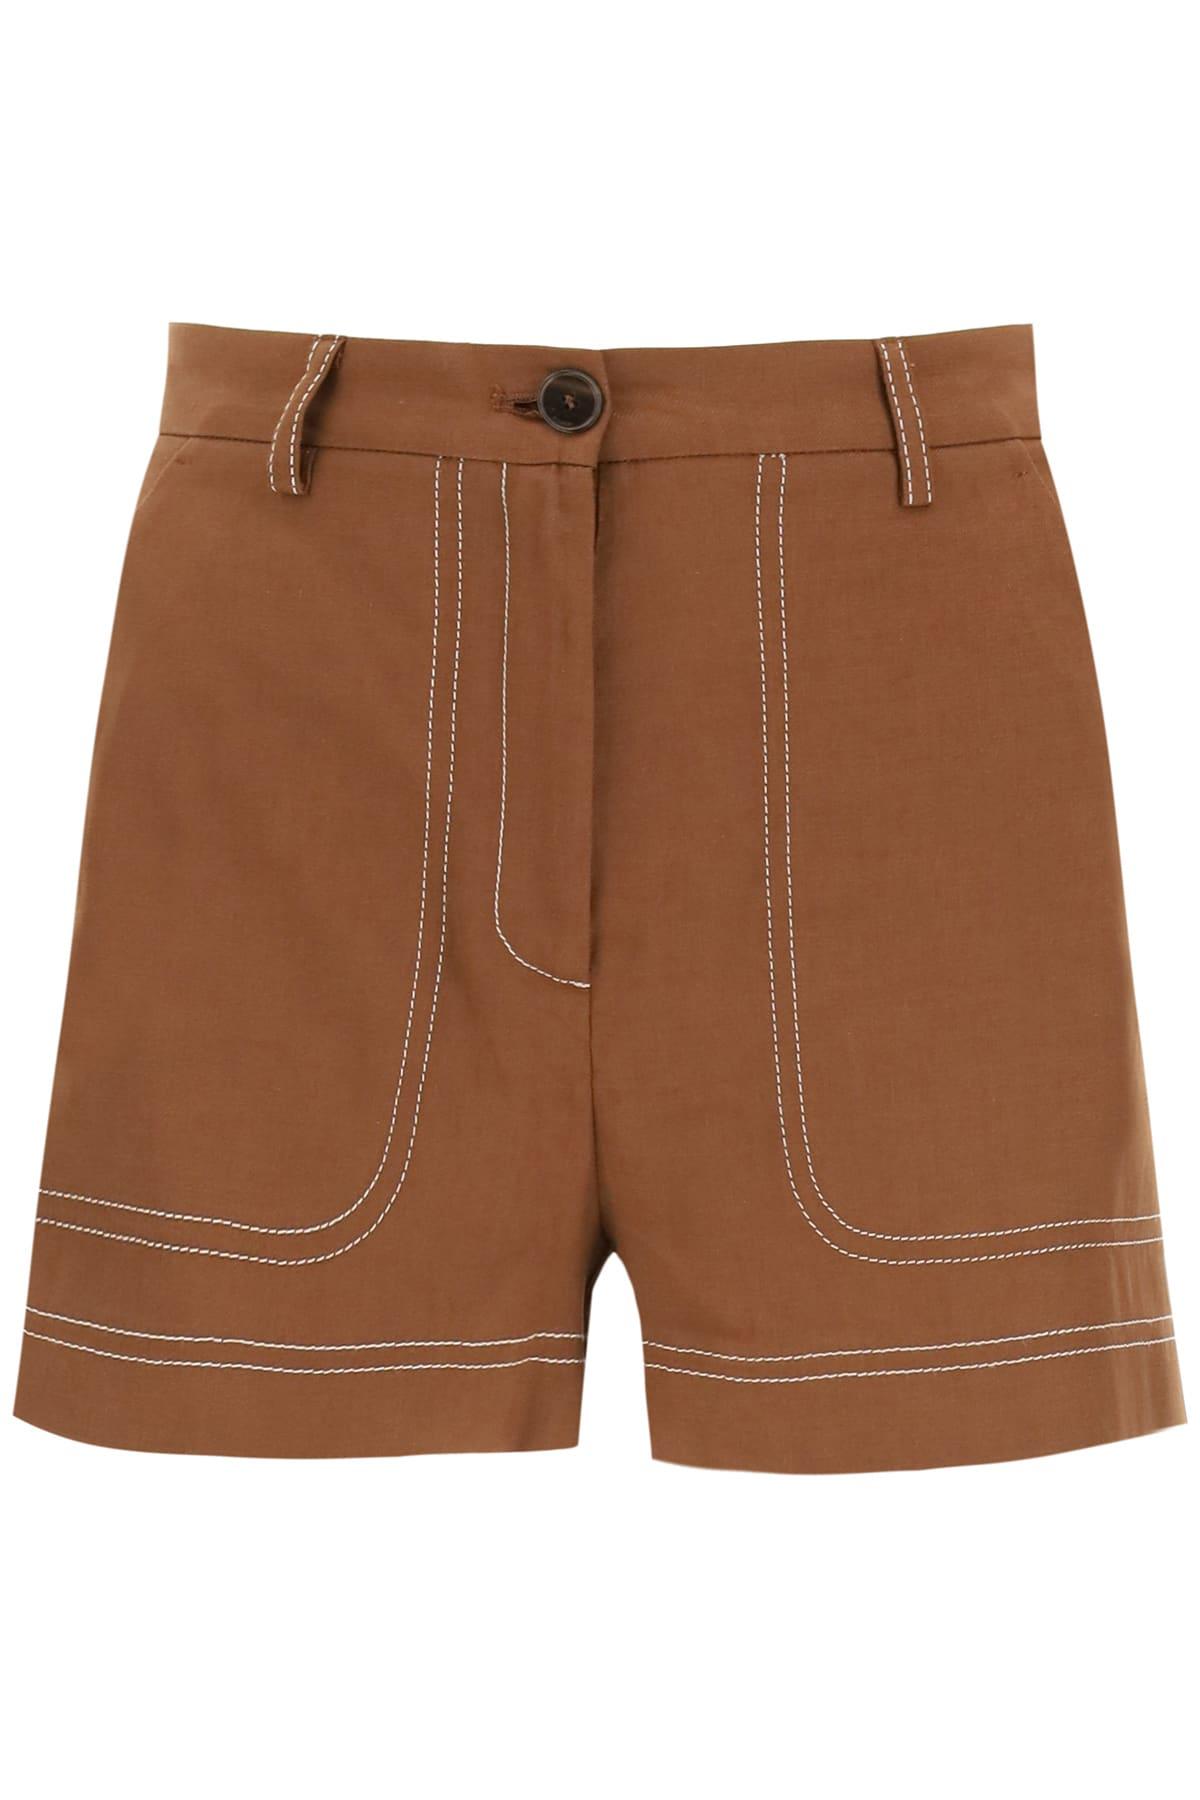 Pinko Shorts COTTON SHORTS